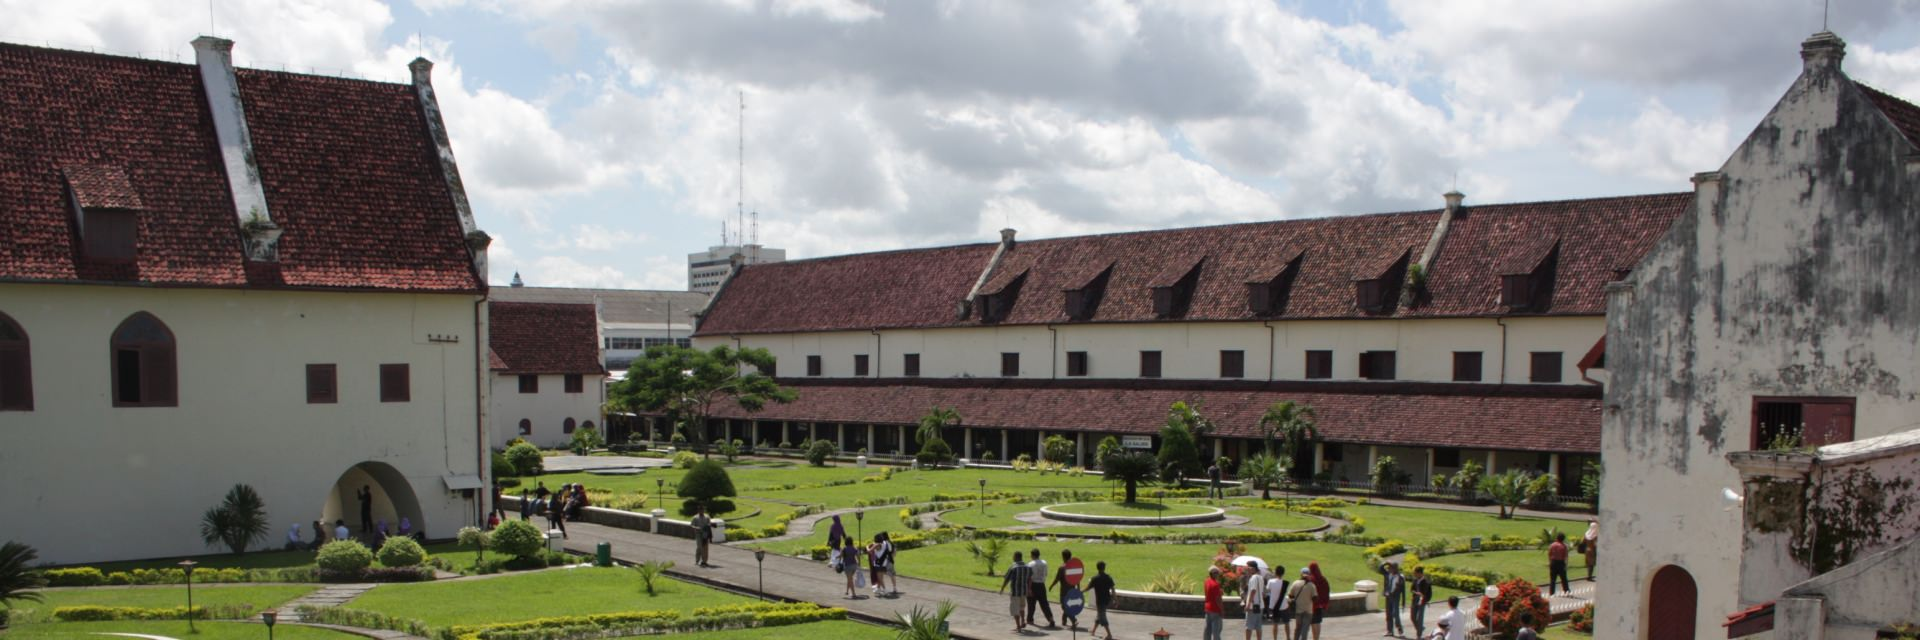 8 Lokasi Wisata Saksi Bisu Kejamnya Zaman Penjajahan di Makassar